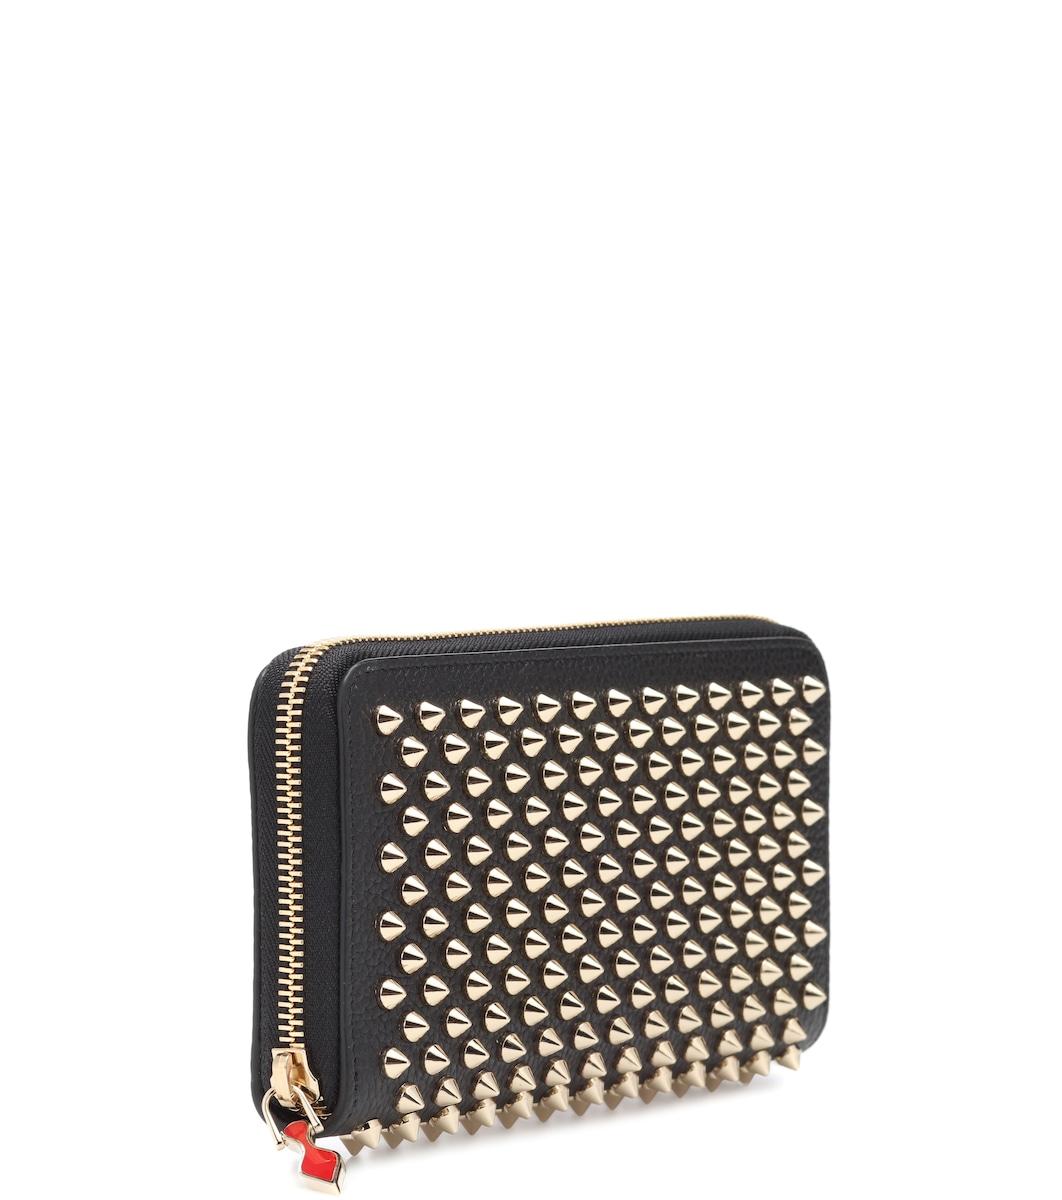 45dfba1b0a Panettone Leather Wallet - Christian Louboutin | mytheresa.com